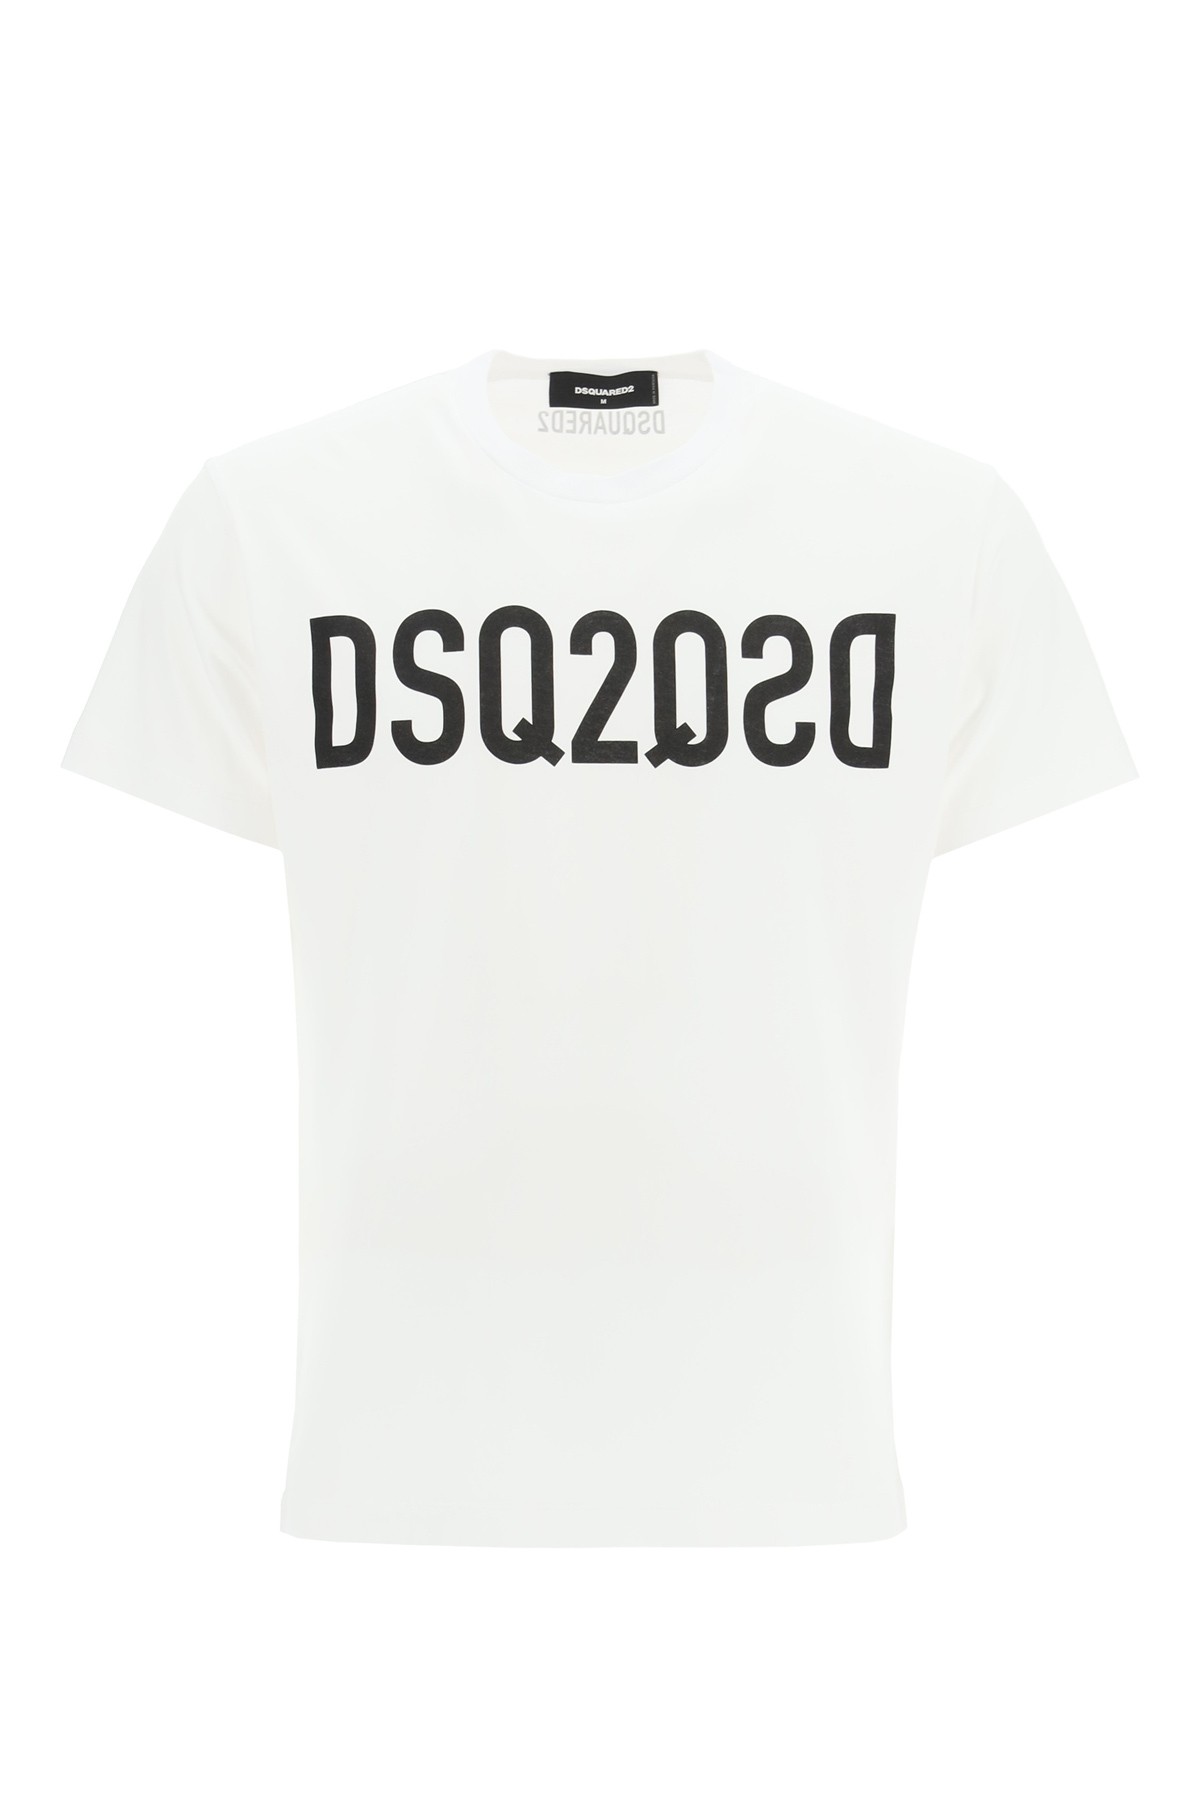 Dsquared2 t-shirt stampa dsq2